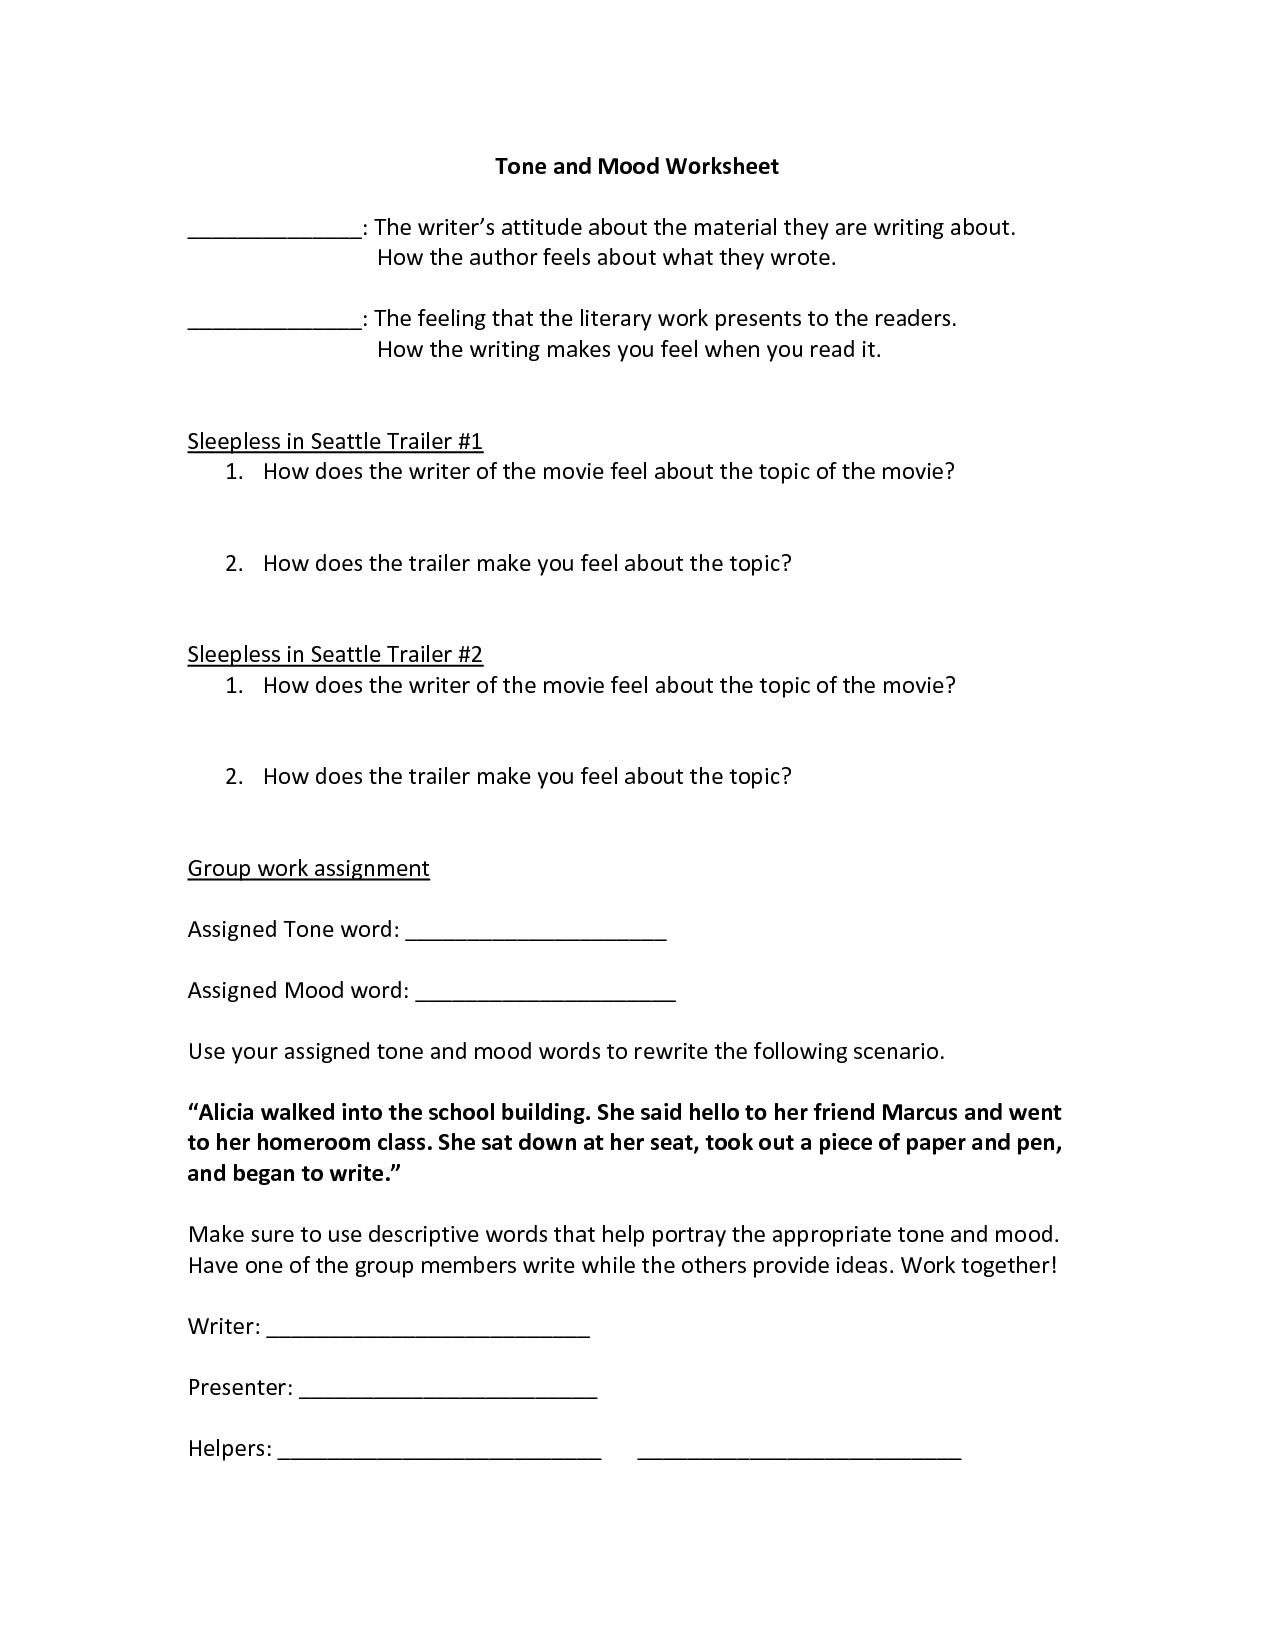 worksheet Mood And Tone Worksheets tone and mood worksheet writing pinterest worksheets worksheet